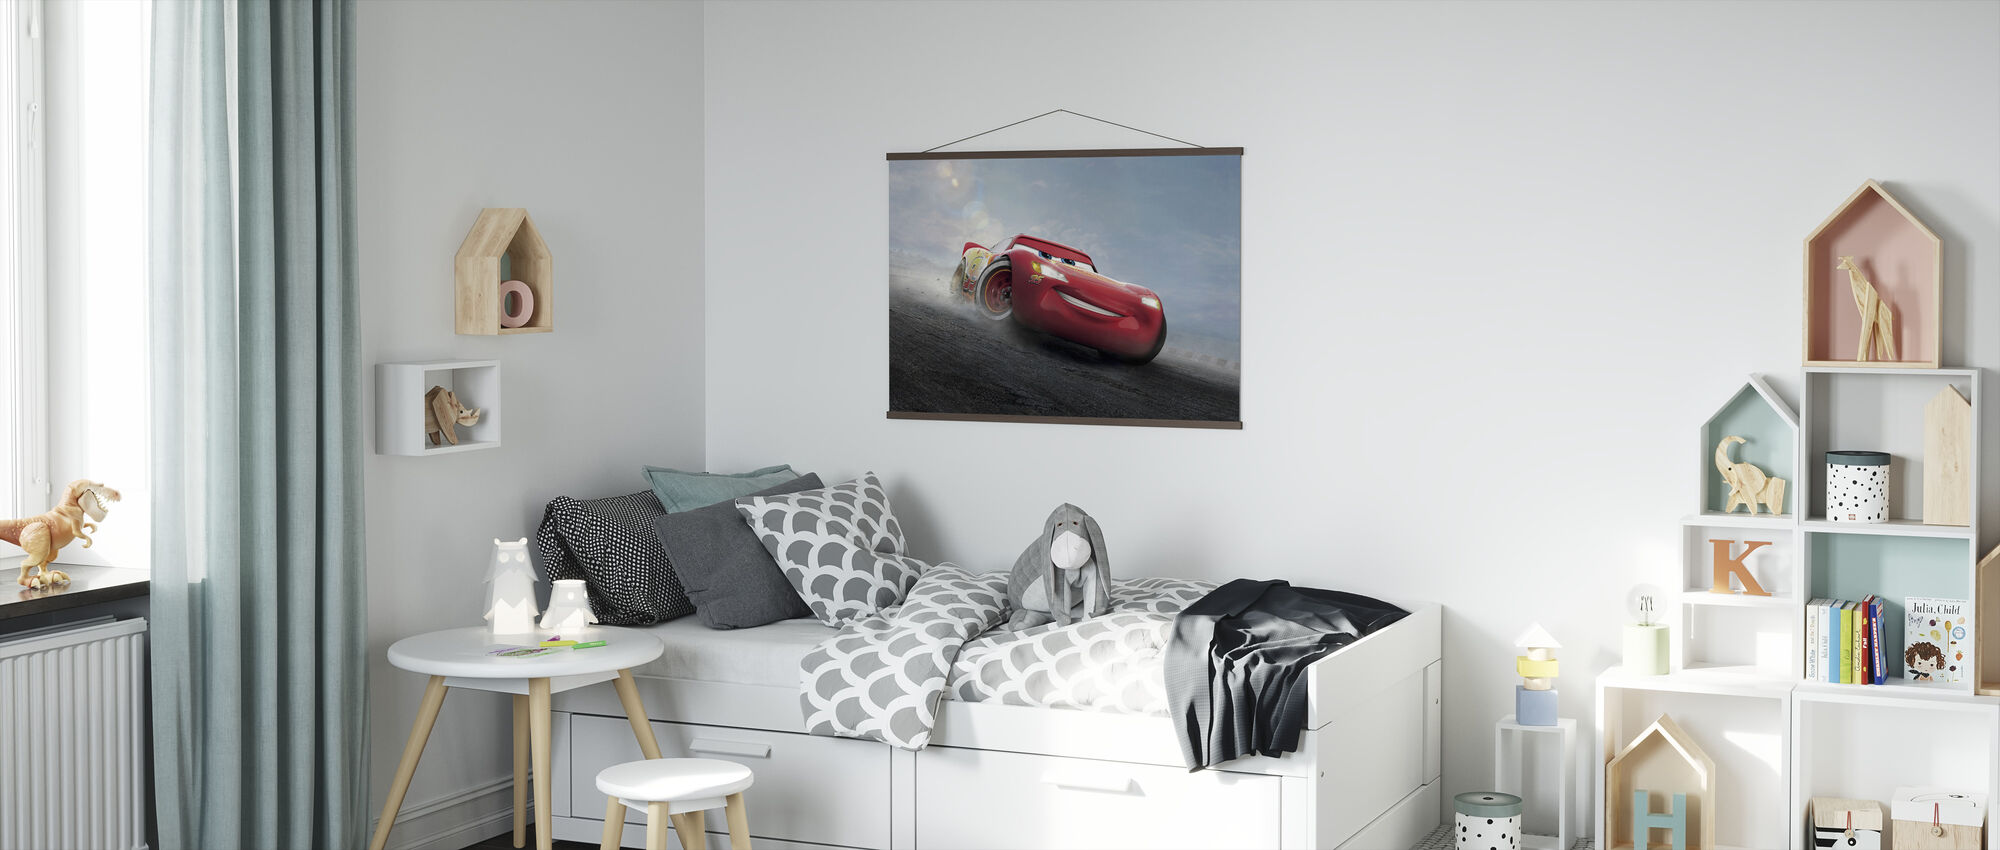 Biler 3 - Den legendariske lynet McQueen - Plakat - Barnerom